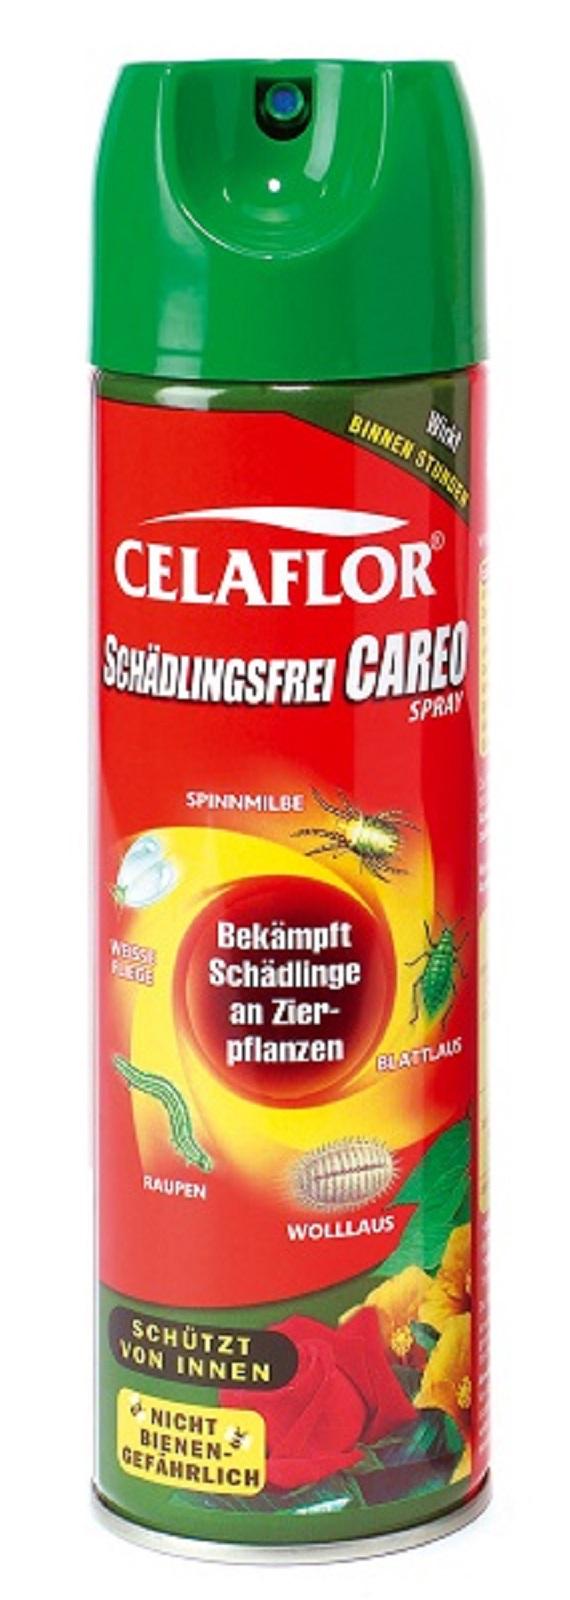 Celaflor Schädlingsfrei CAREO Spray Neu 400 ml